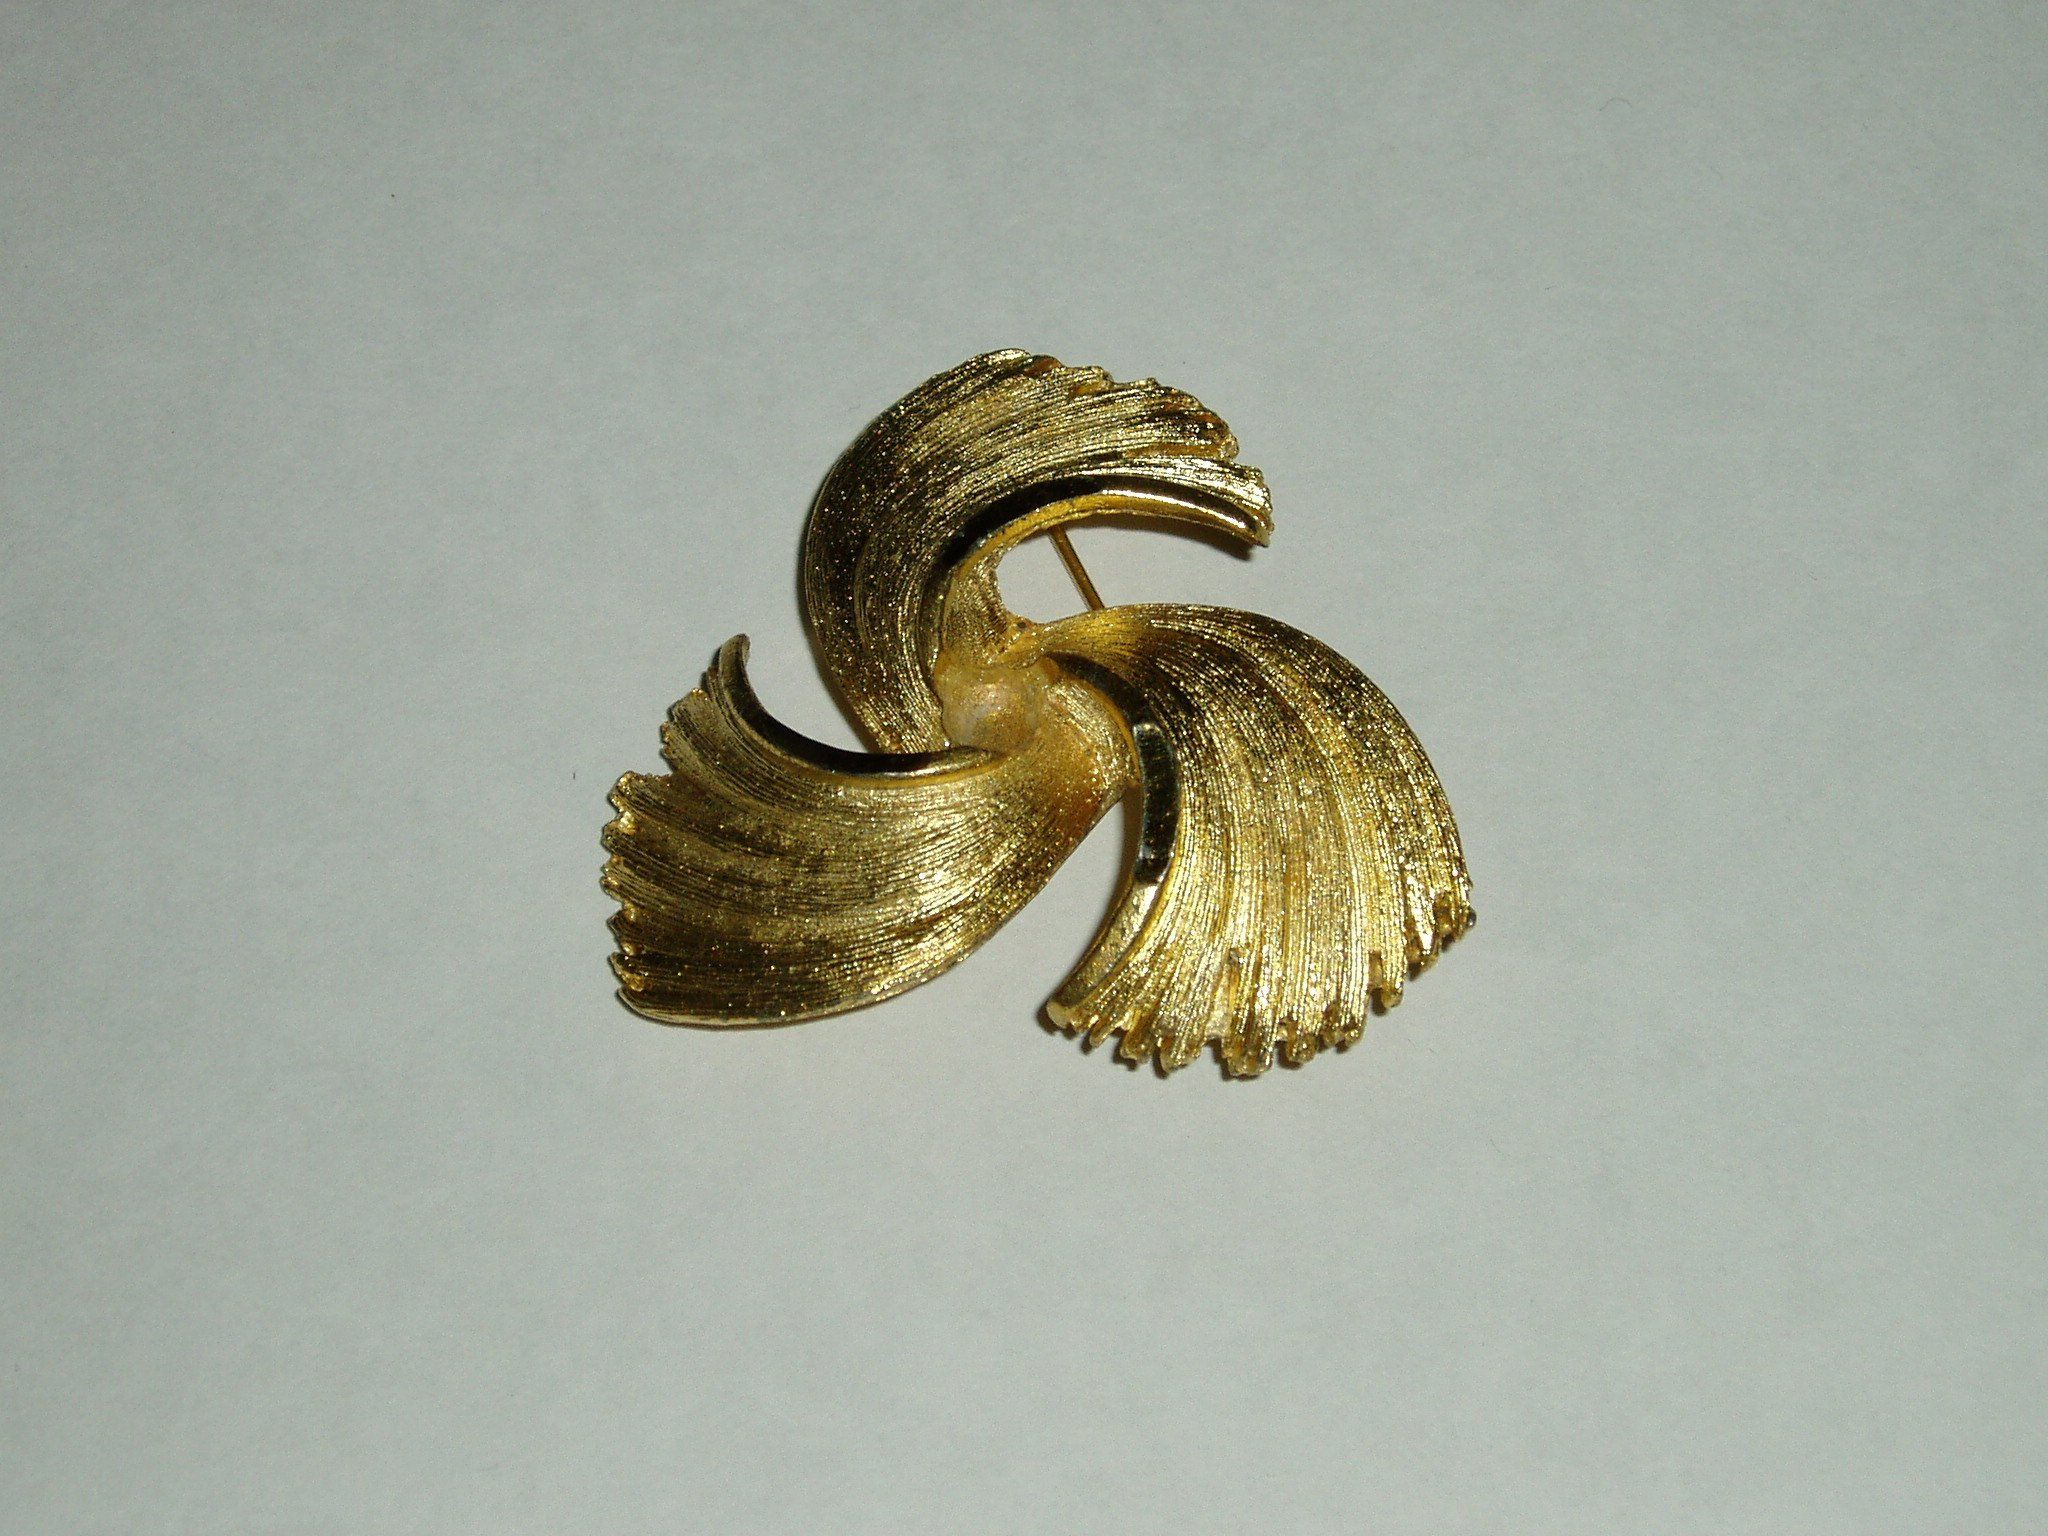 011c16bde53 vintage brooch - retro pin - gold tone jewellery - B.K.S brooch - unique  brooch - womens jewellery - retro fashion - costume jewellery - 70s  #freeshipping ...